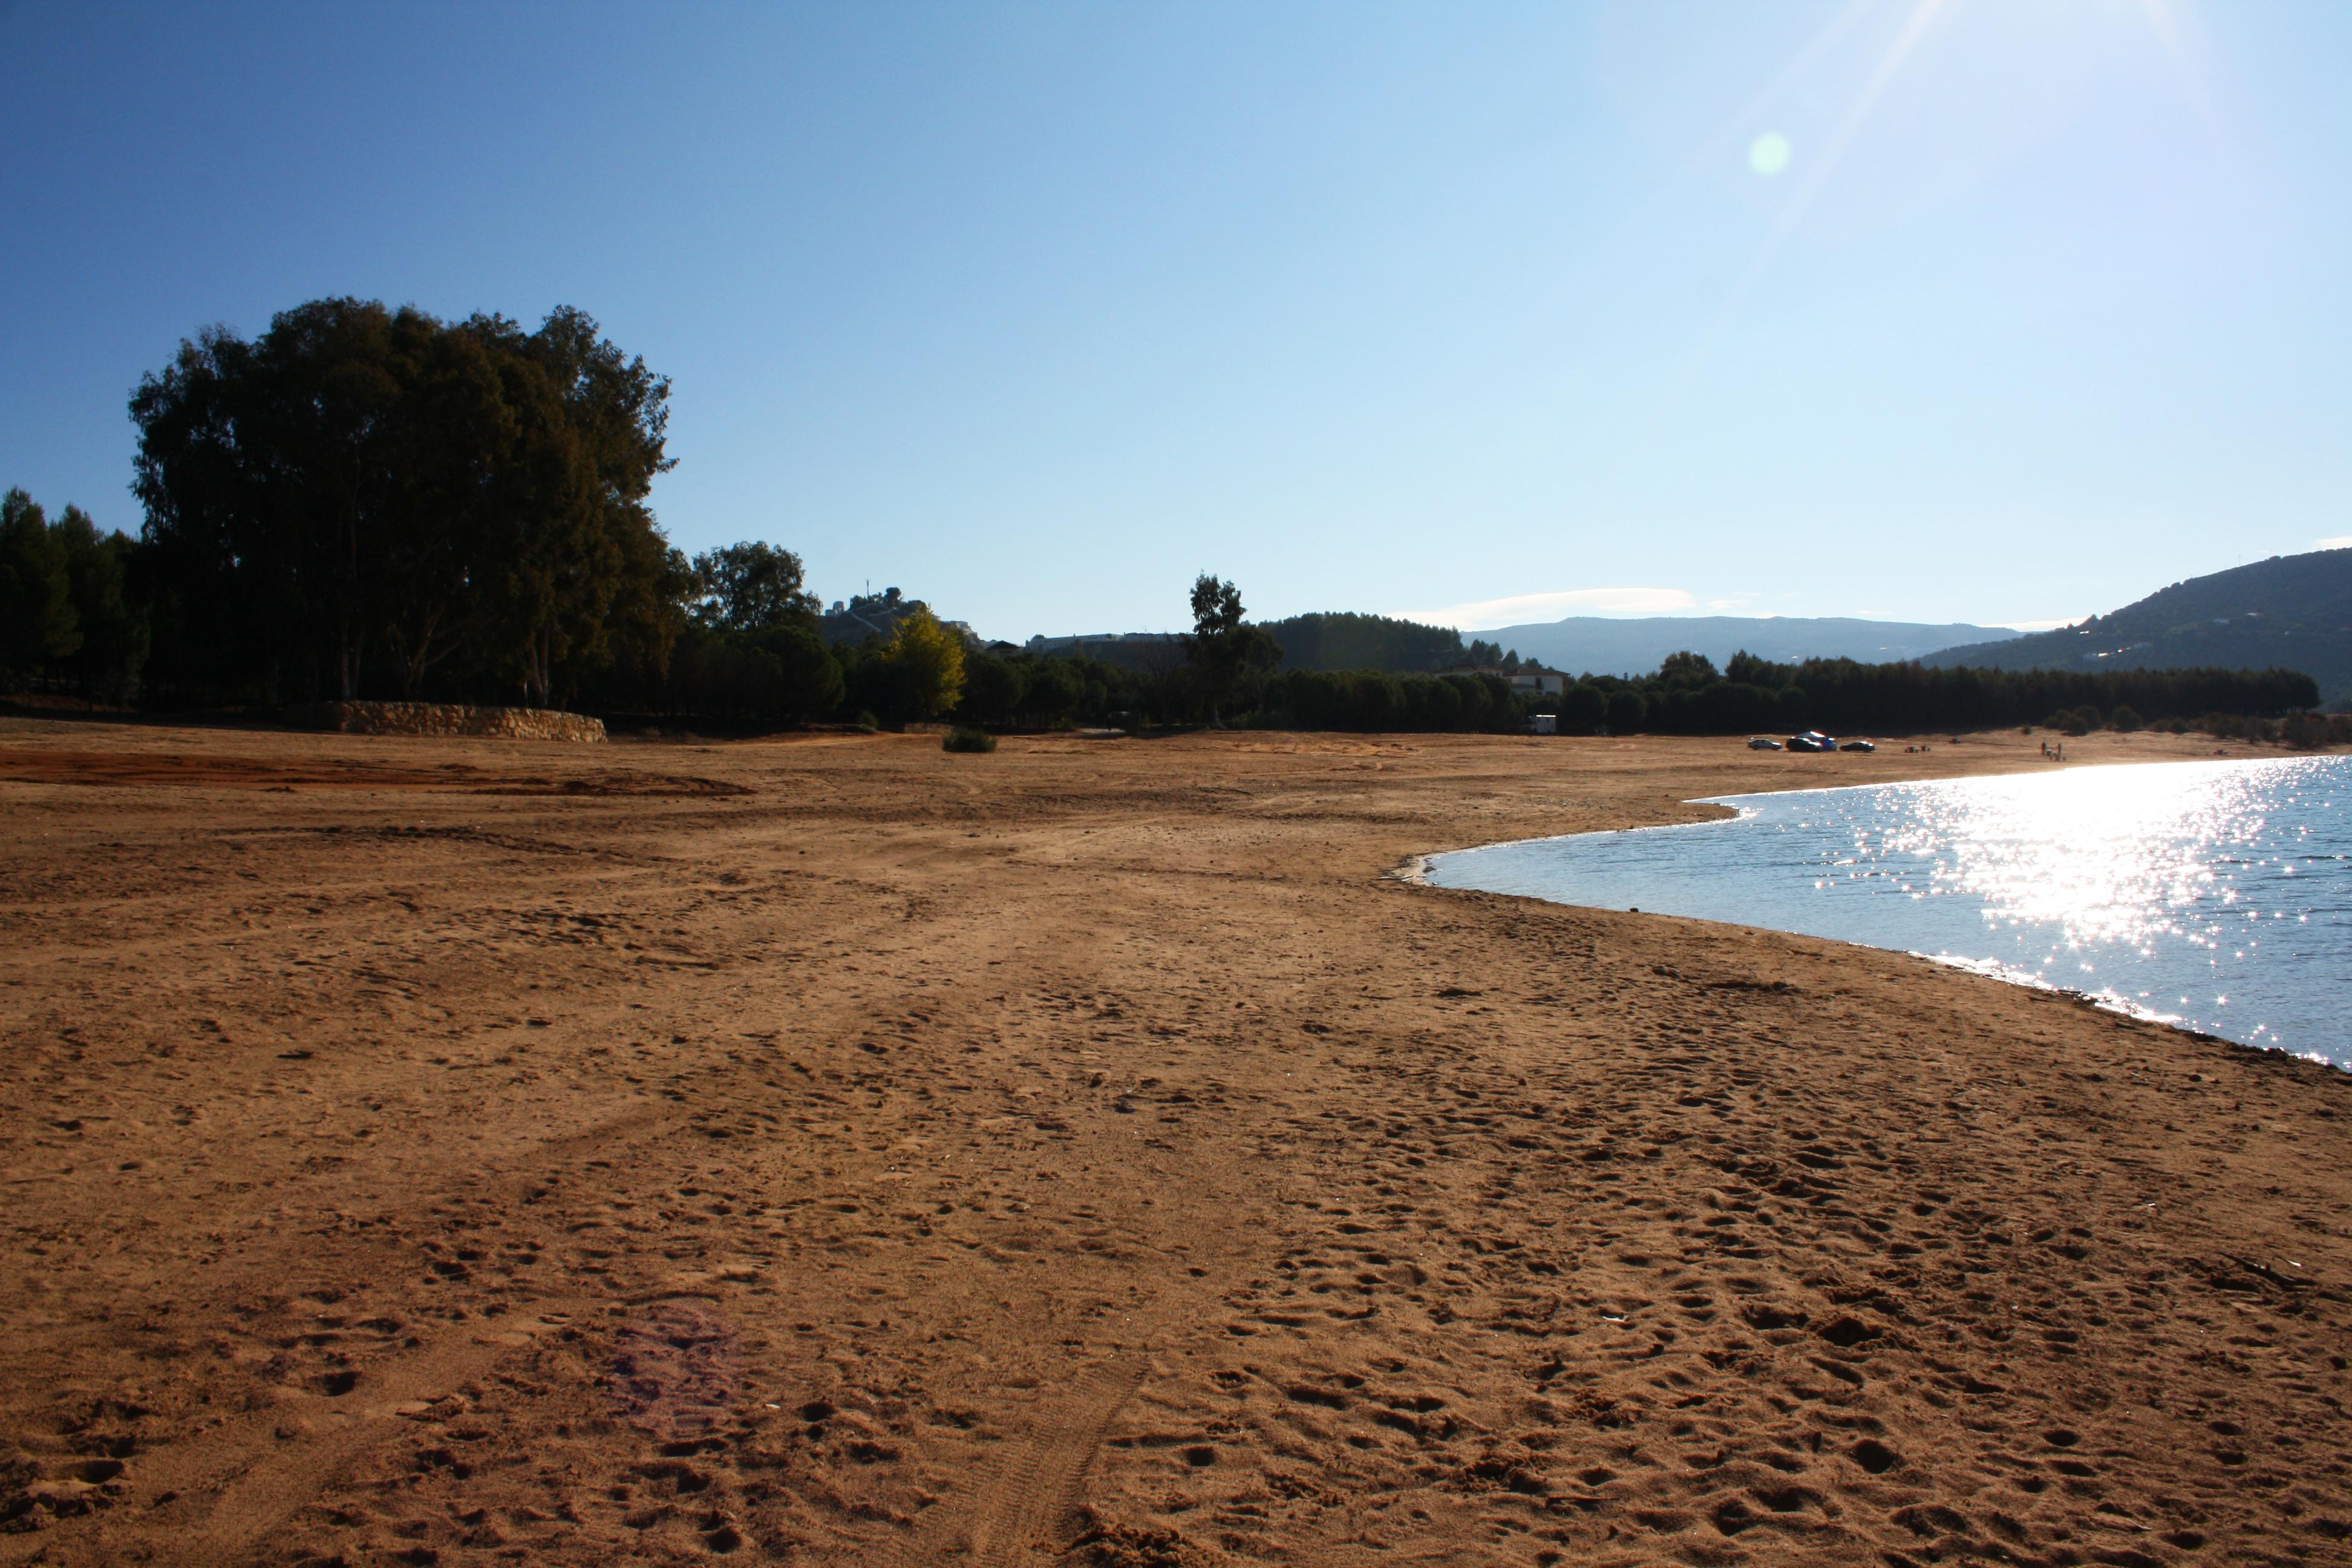 playa de valdearenas 2.jpg